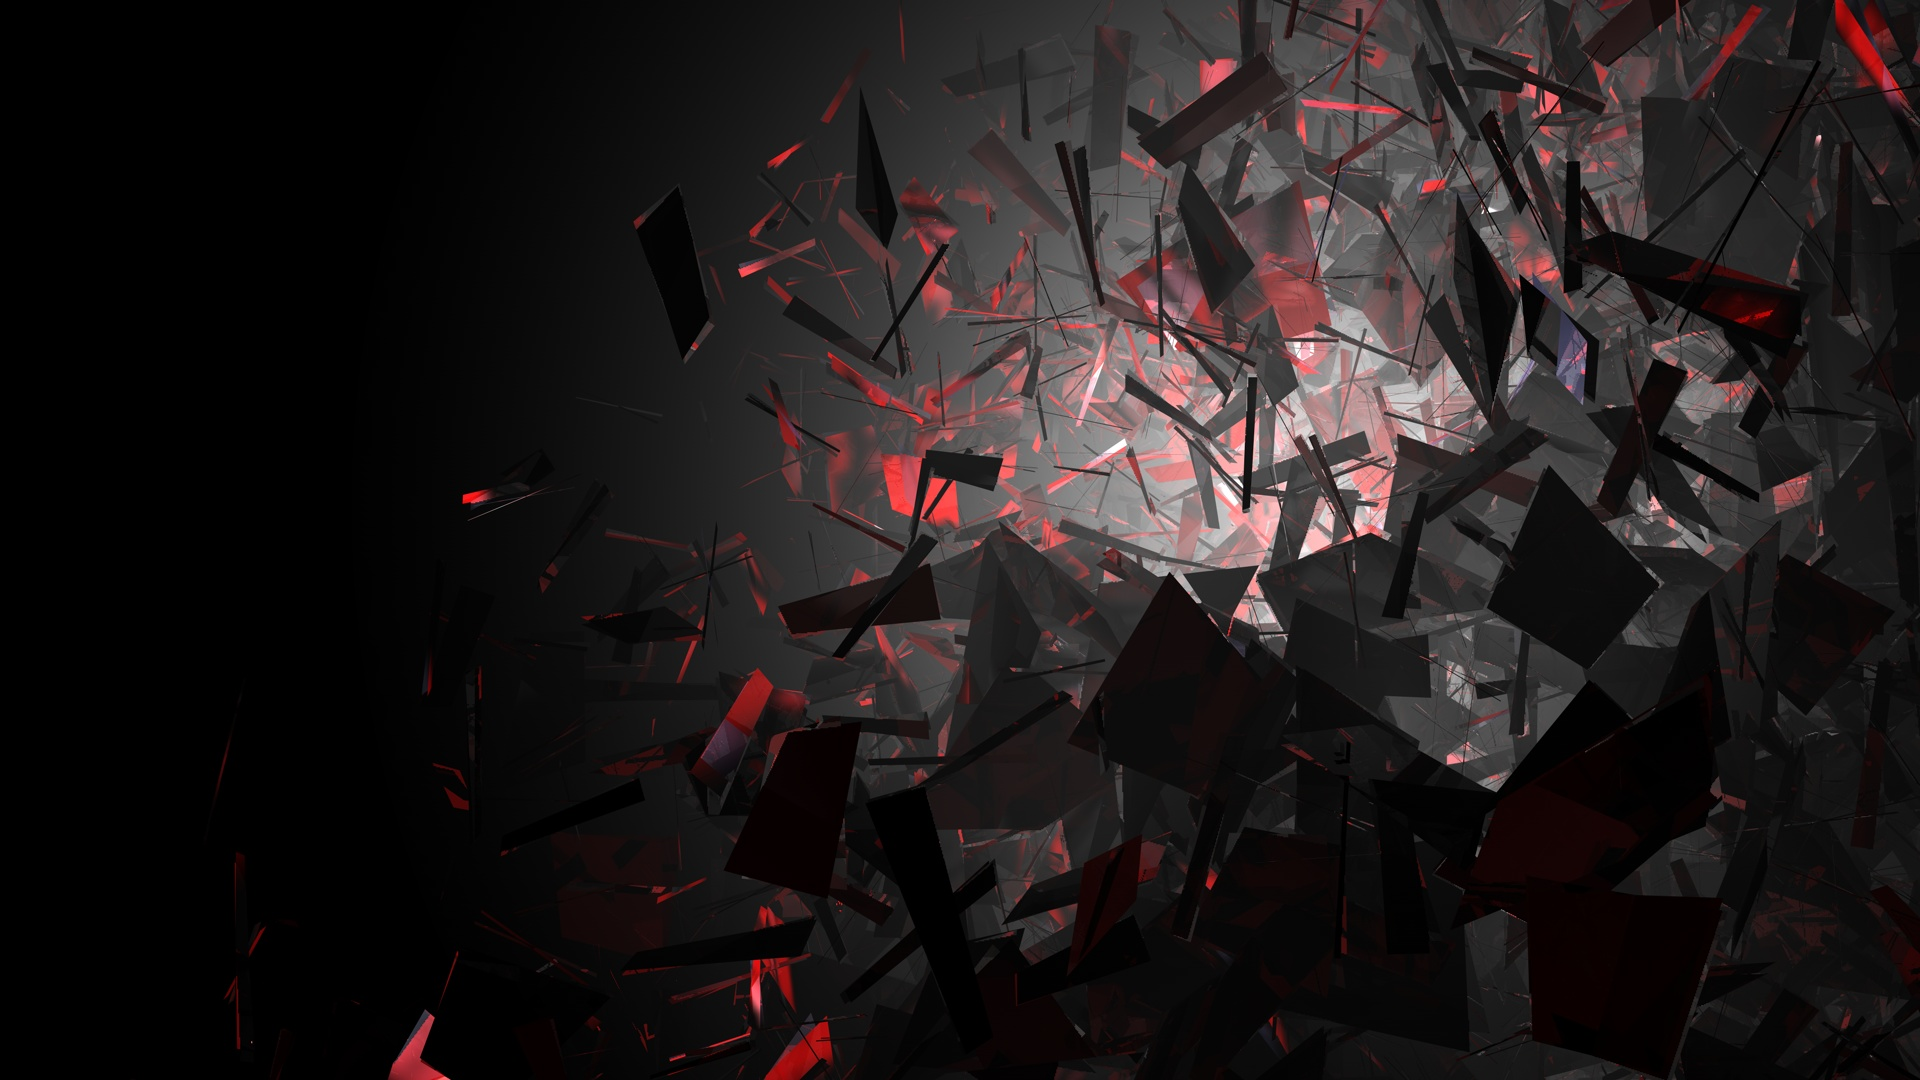 Download Abstract Dark Wallpaper 1920x1080 Wallpoper 172290 1920x1080